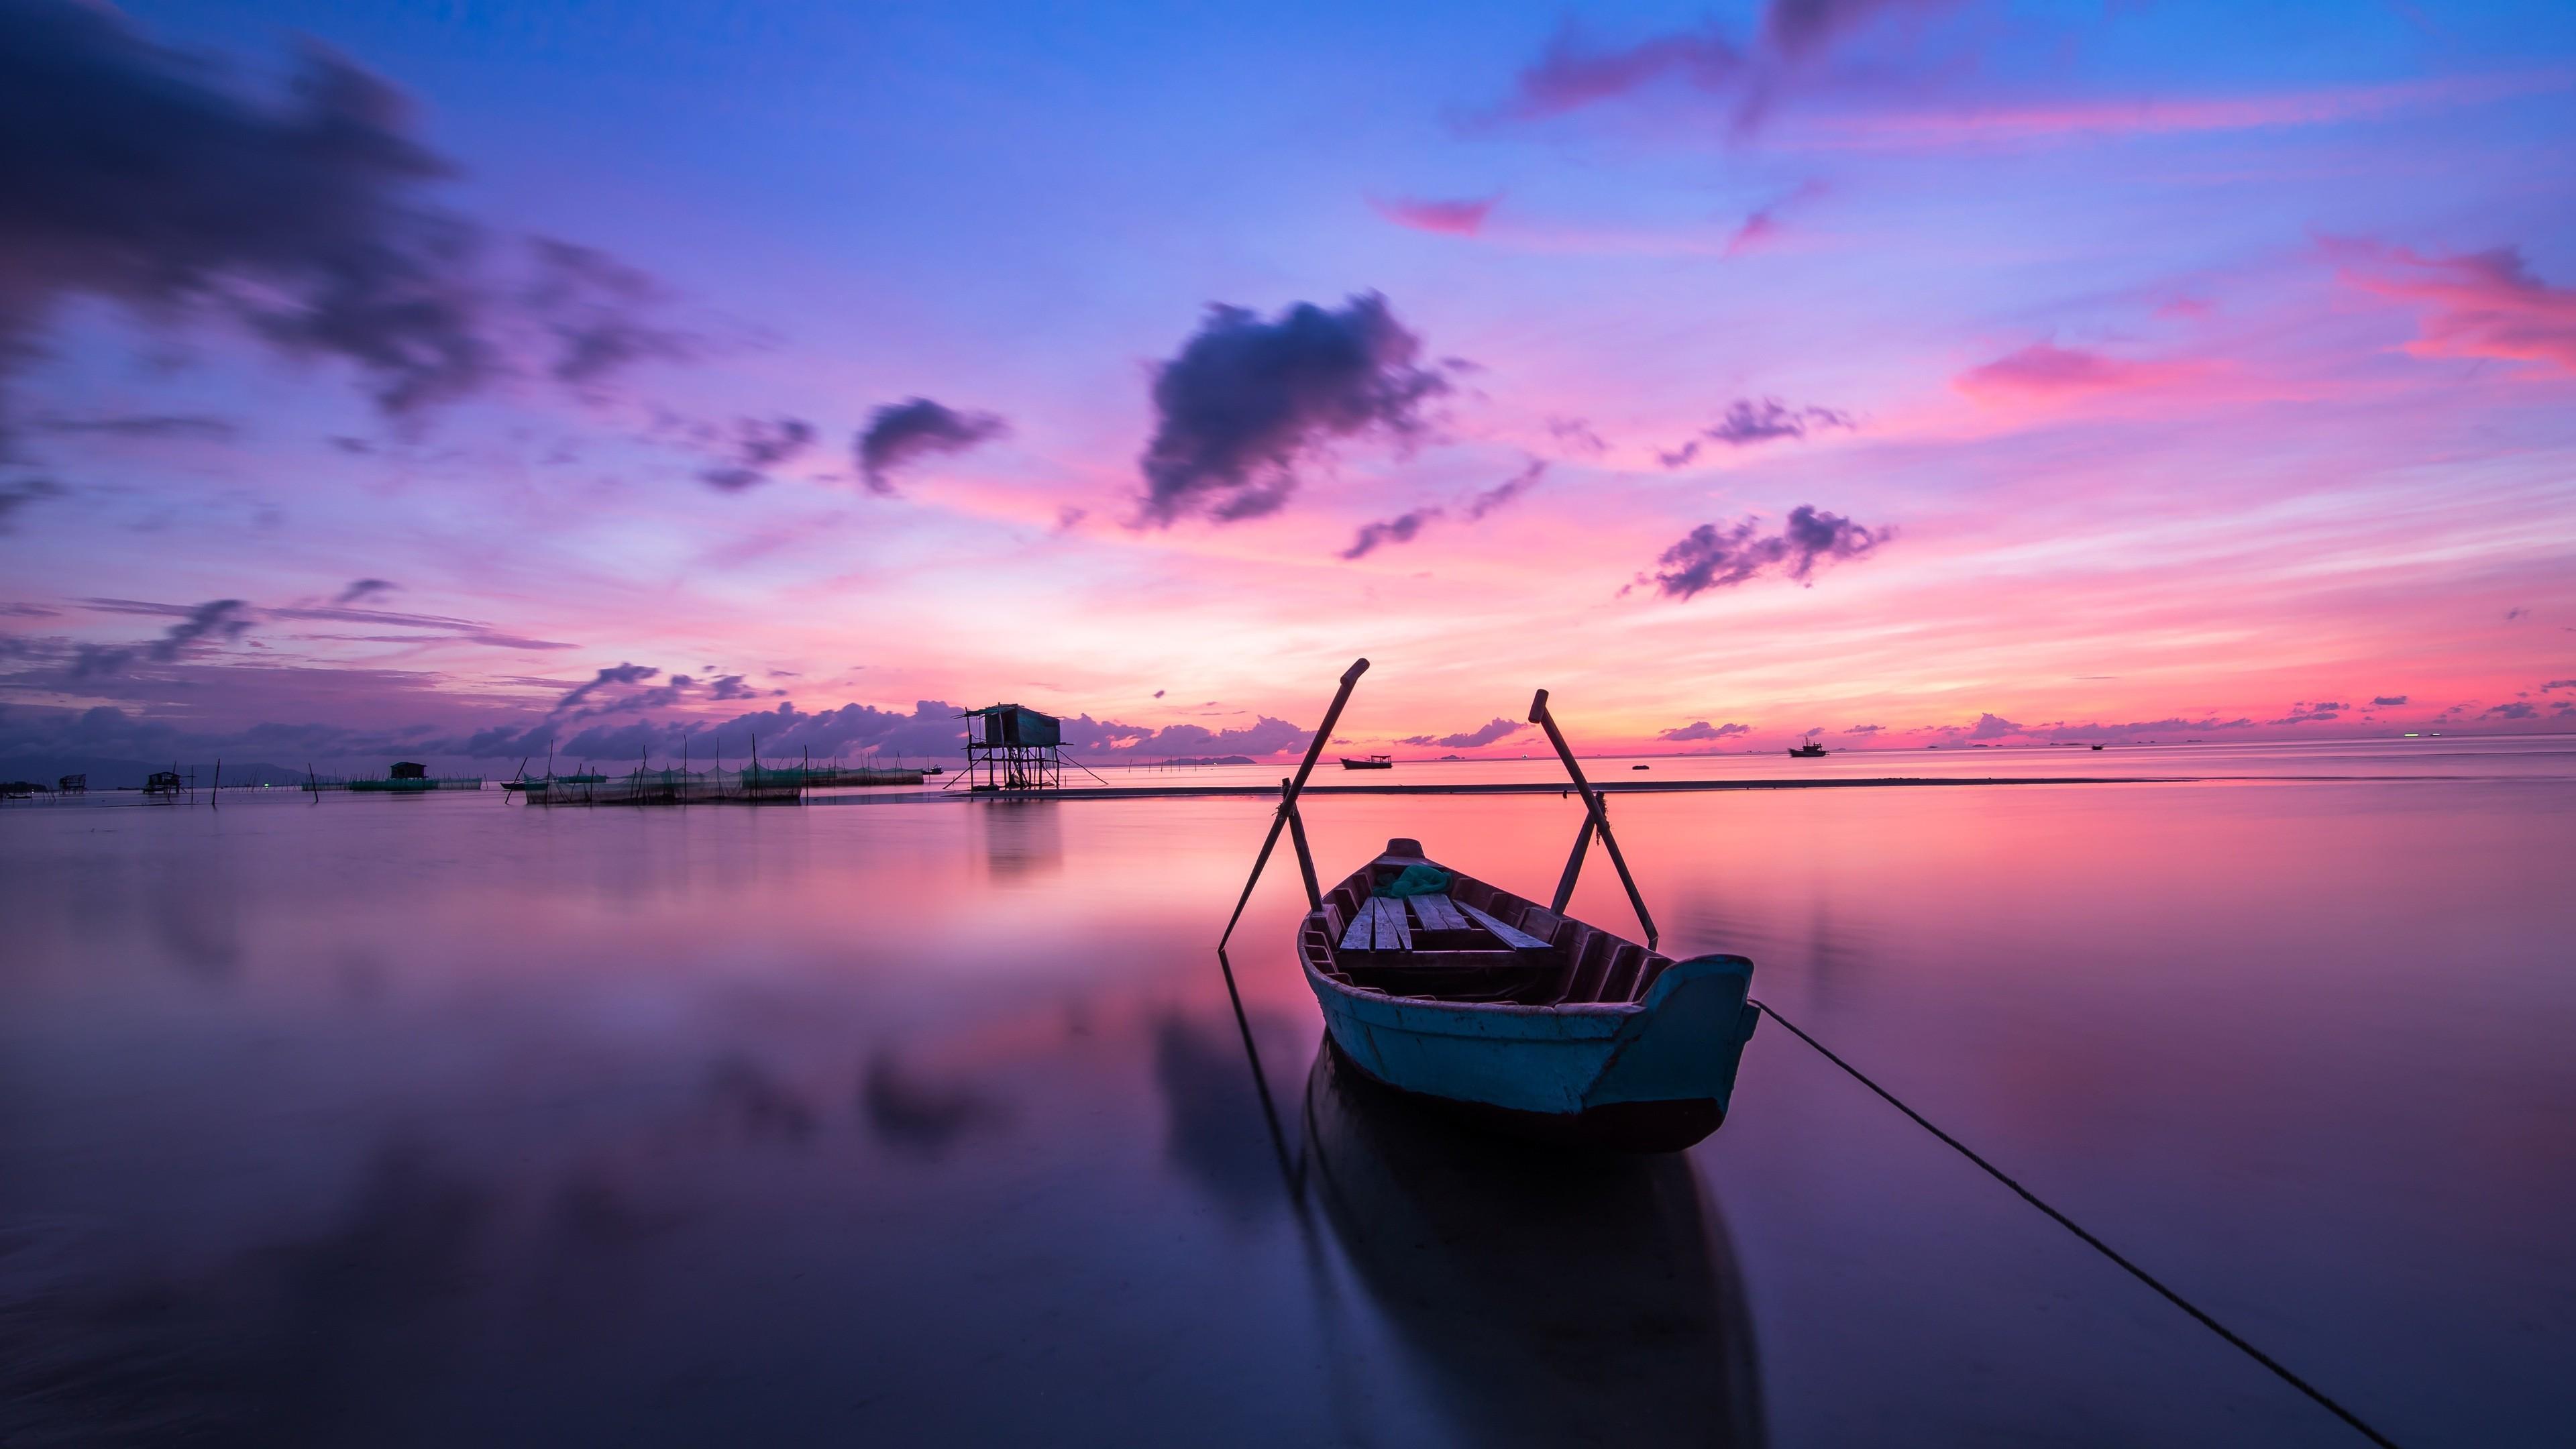 Sunset at Phu Quoc (Vietnam) wallpaper